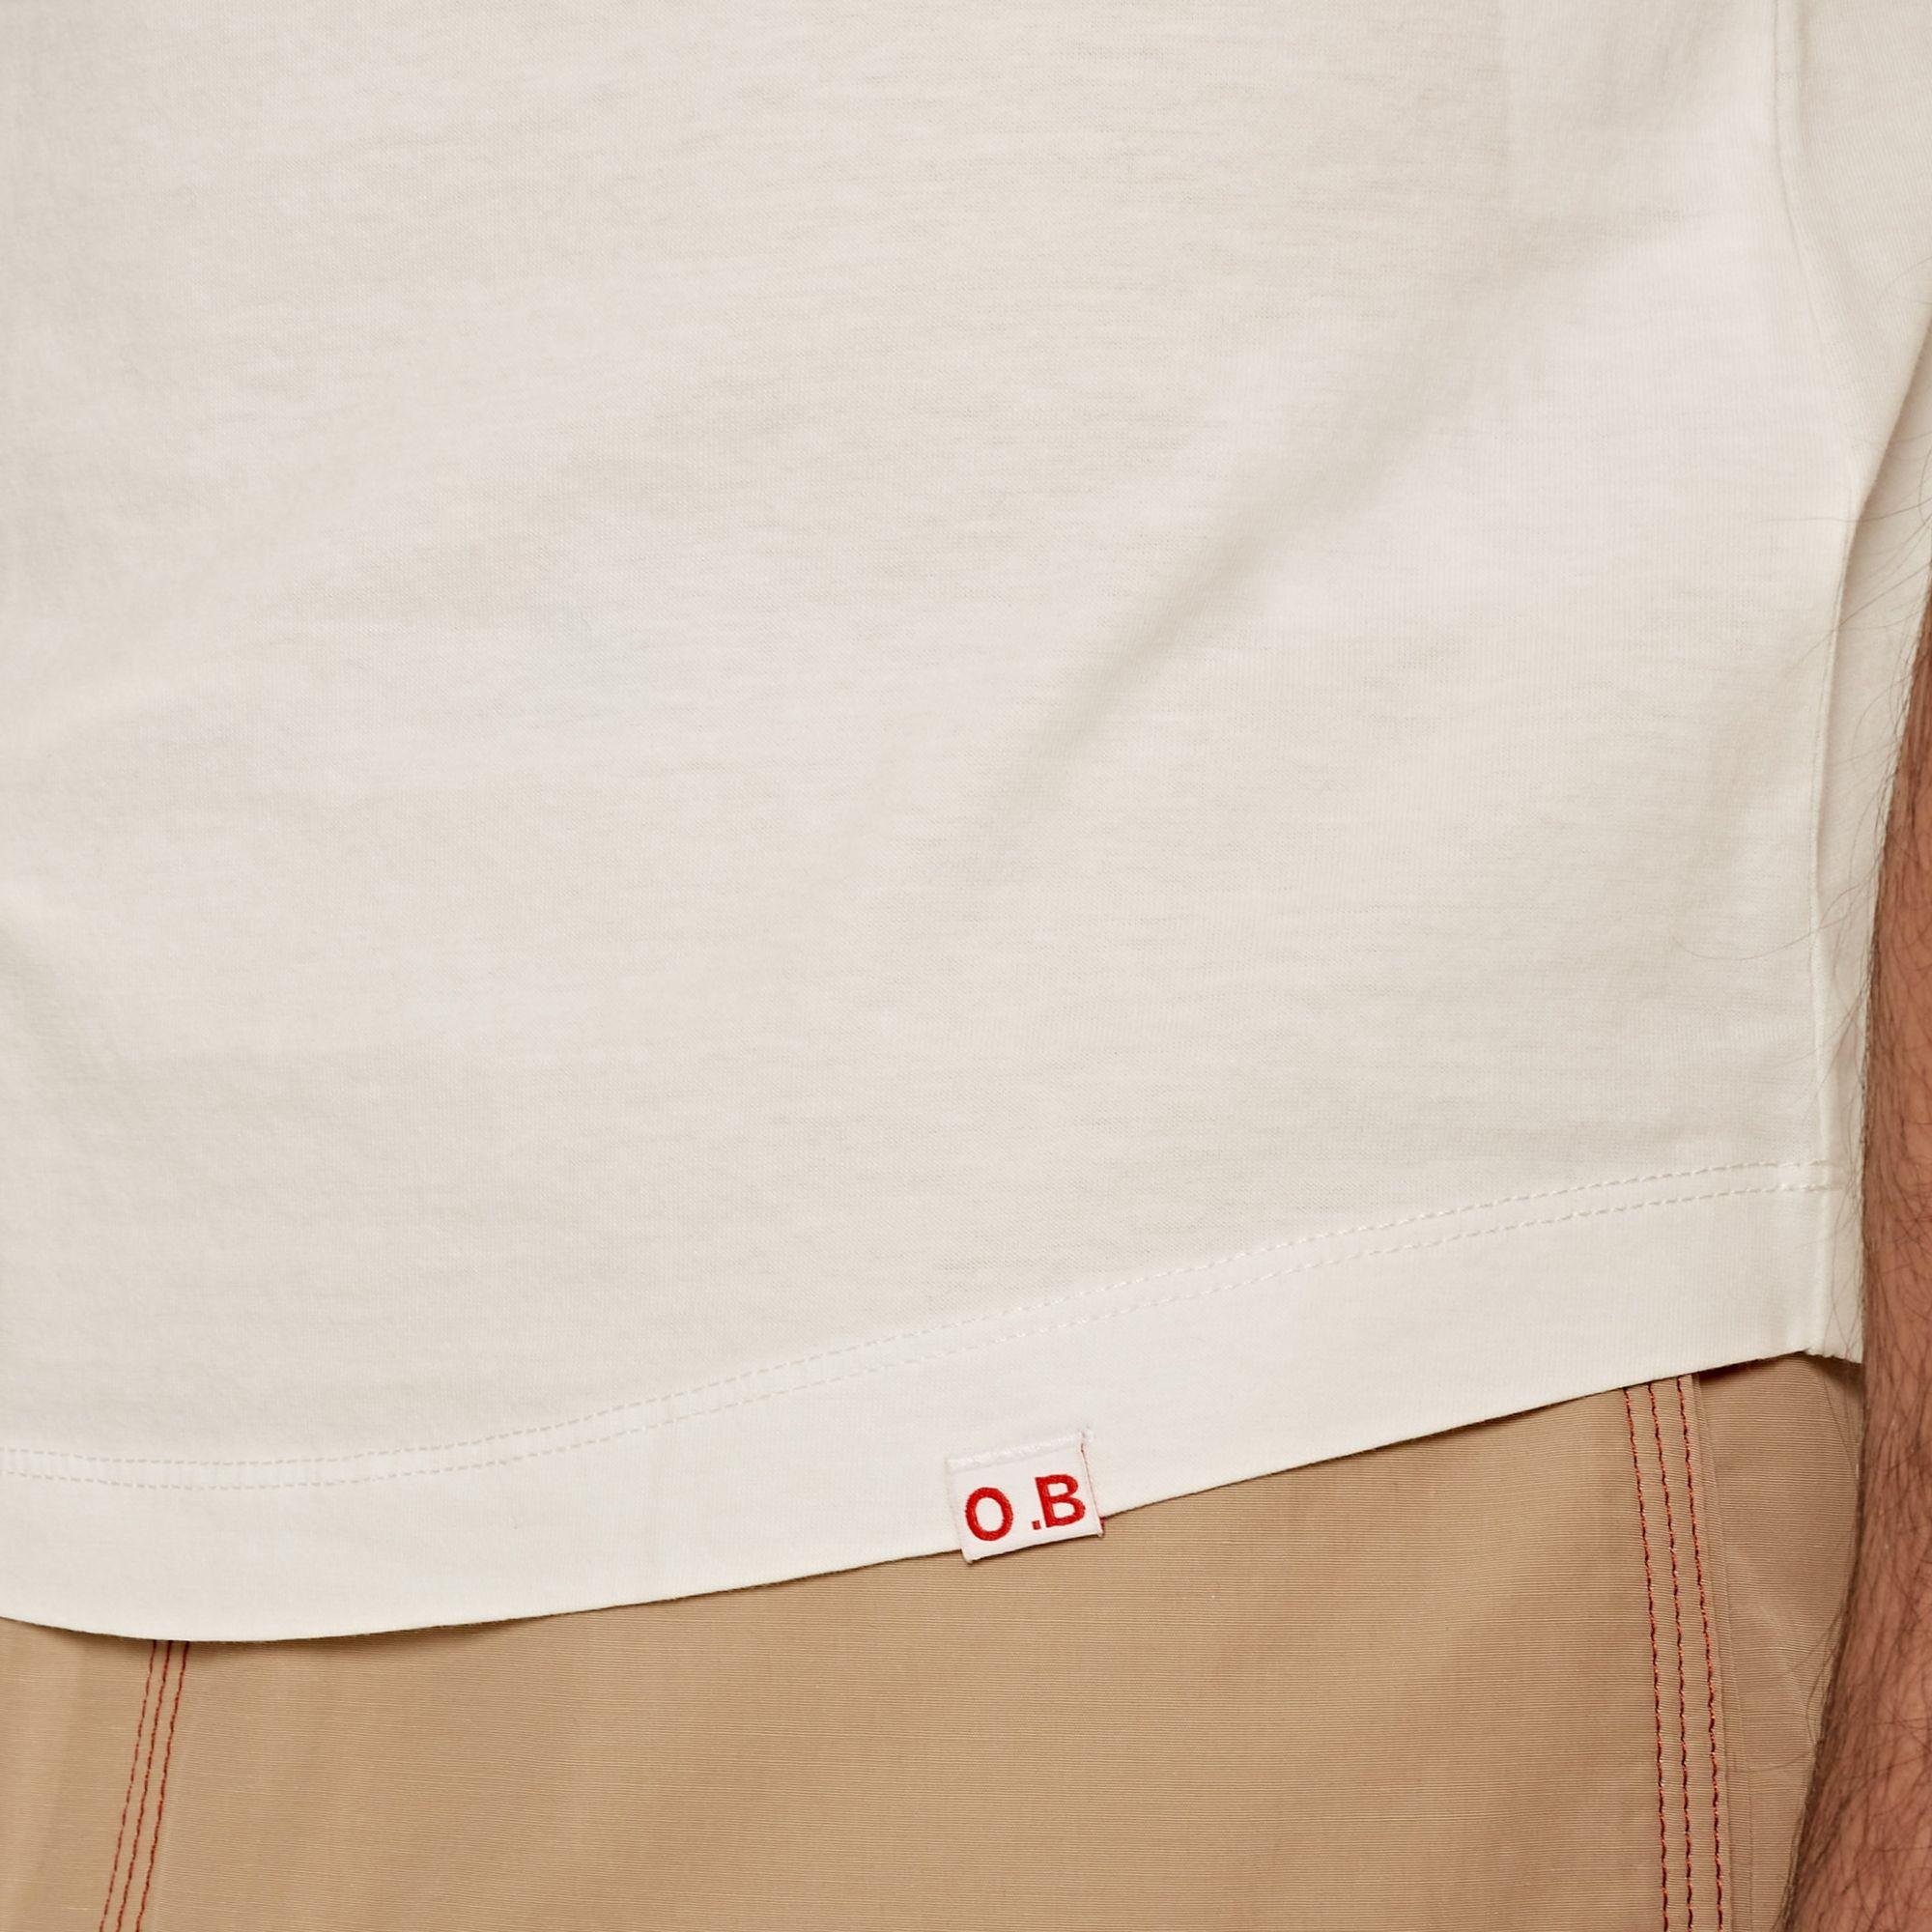 Orlebar Brown OB-T MERCERISED